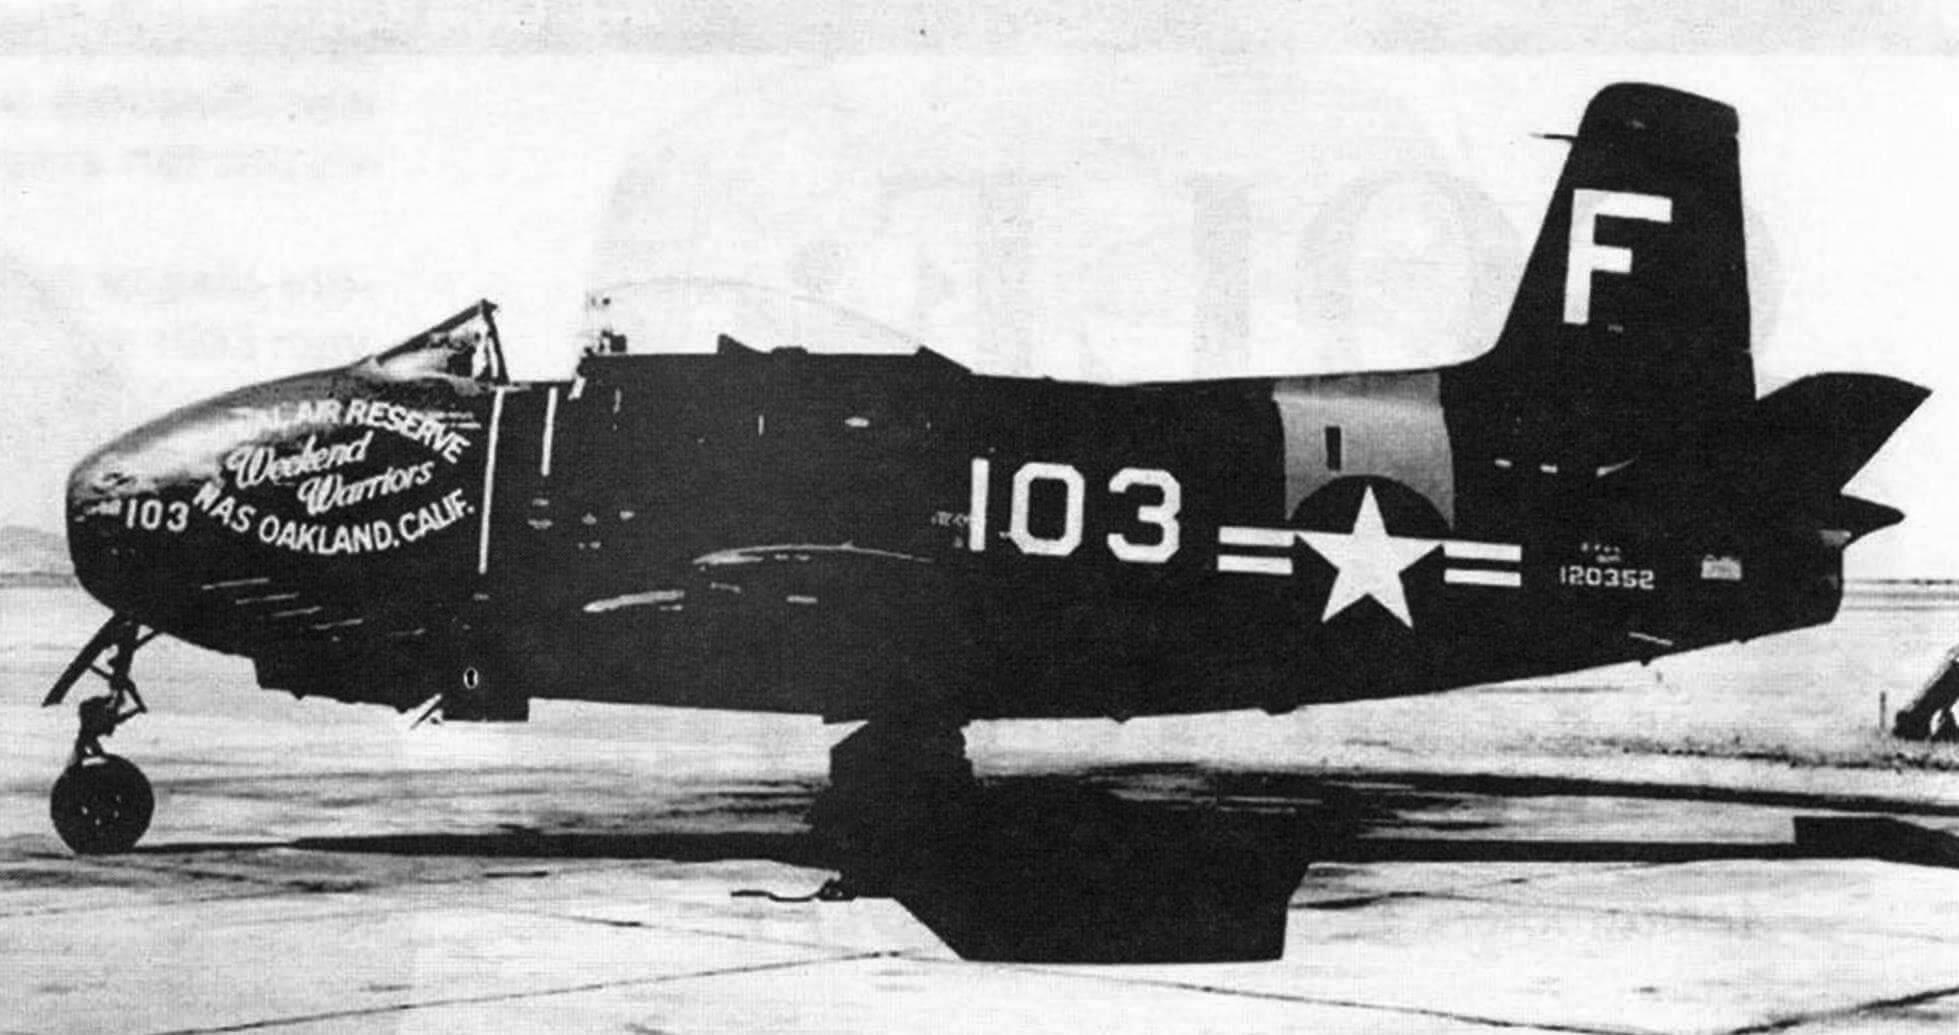 Истребитель FJ-1 авиации резерва ВМС США